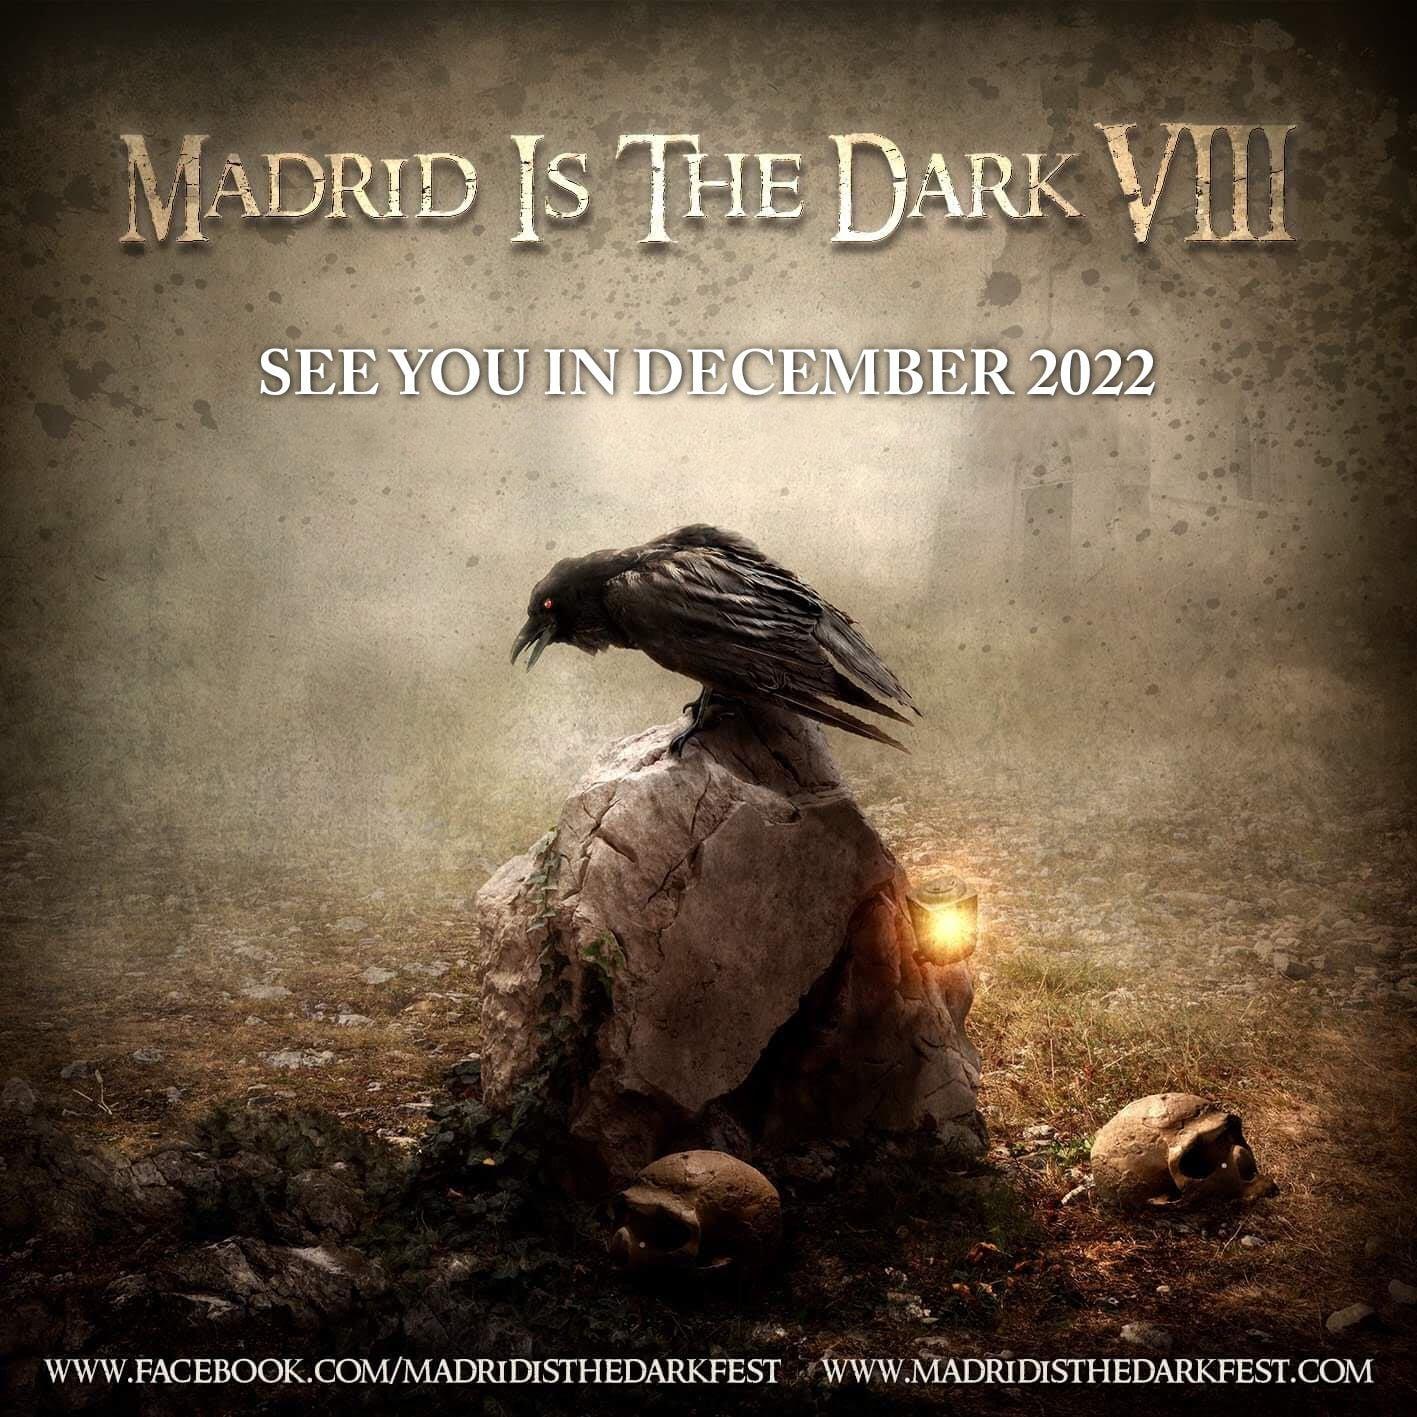 madrid is the dark 2022